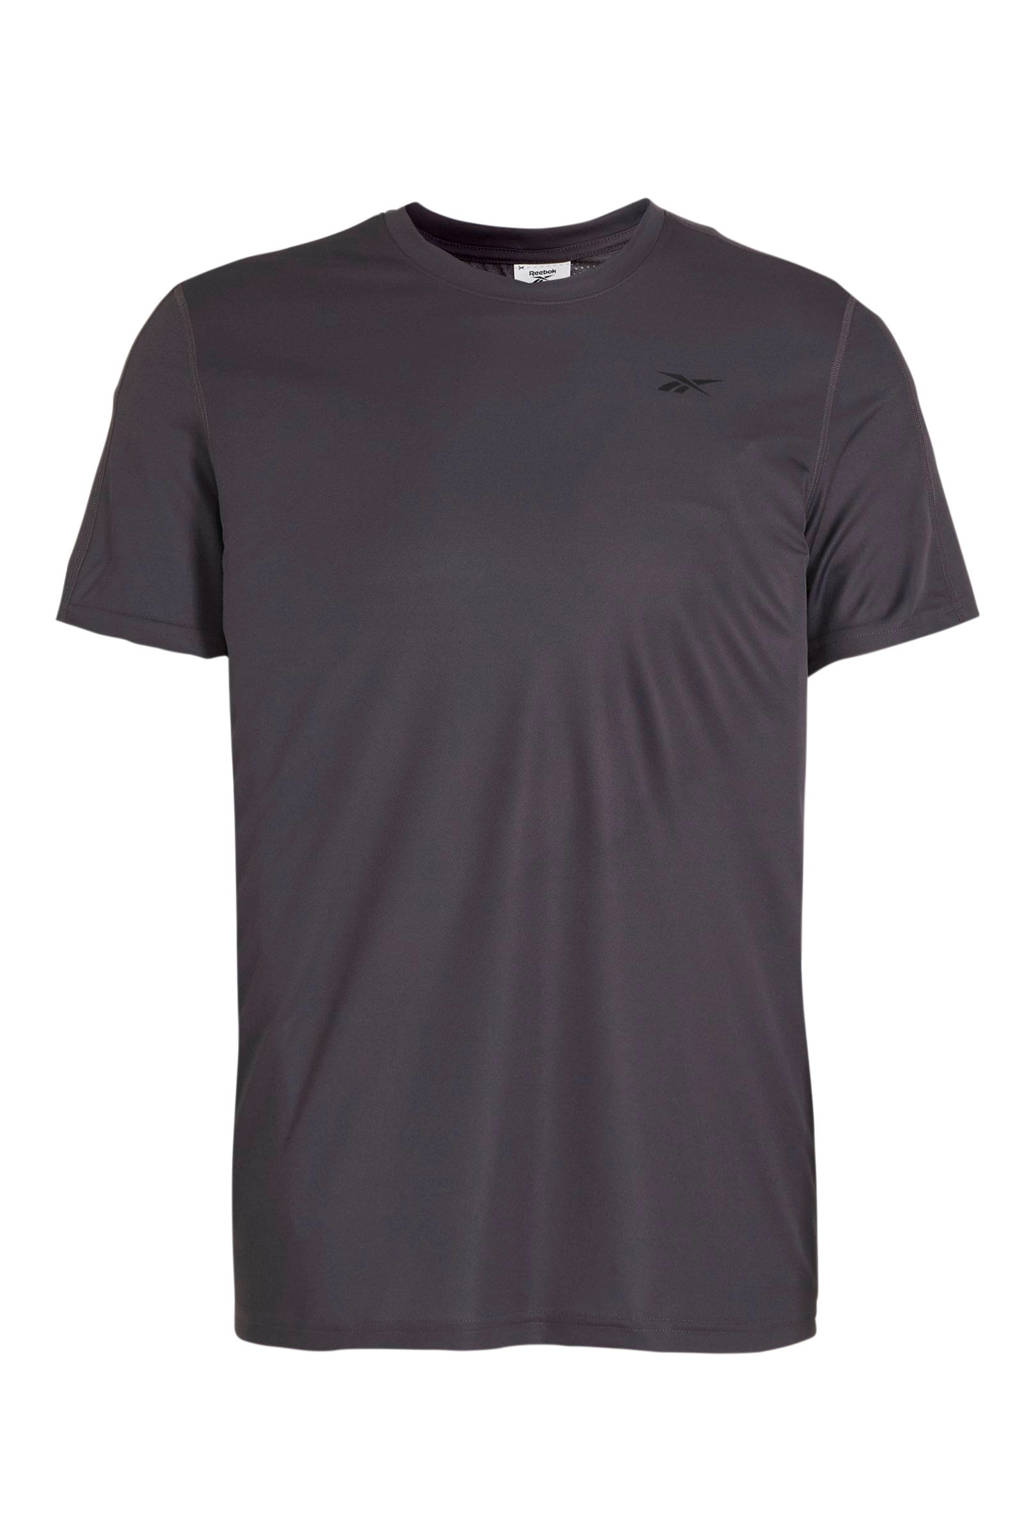 Reebok Training   sport T-shirt grijs, Grijs